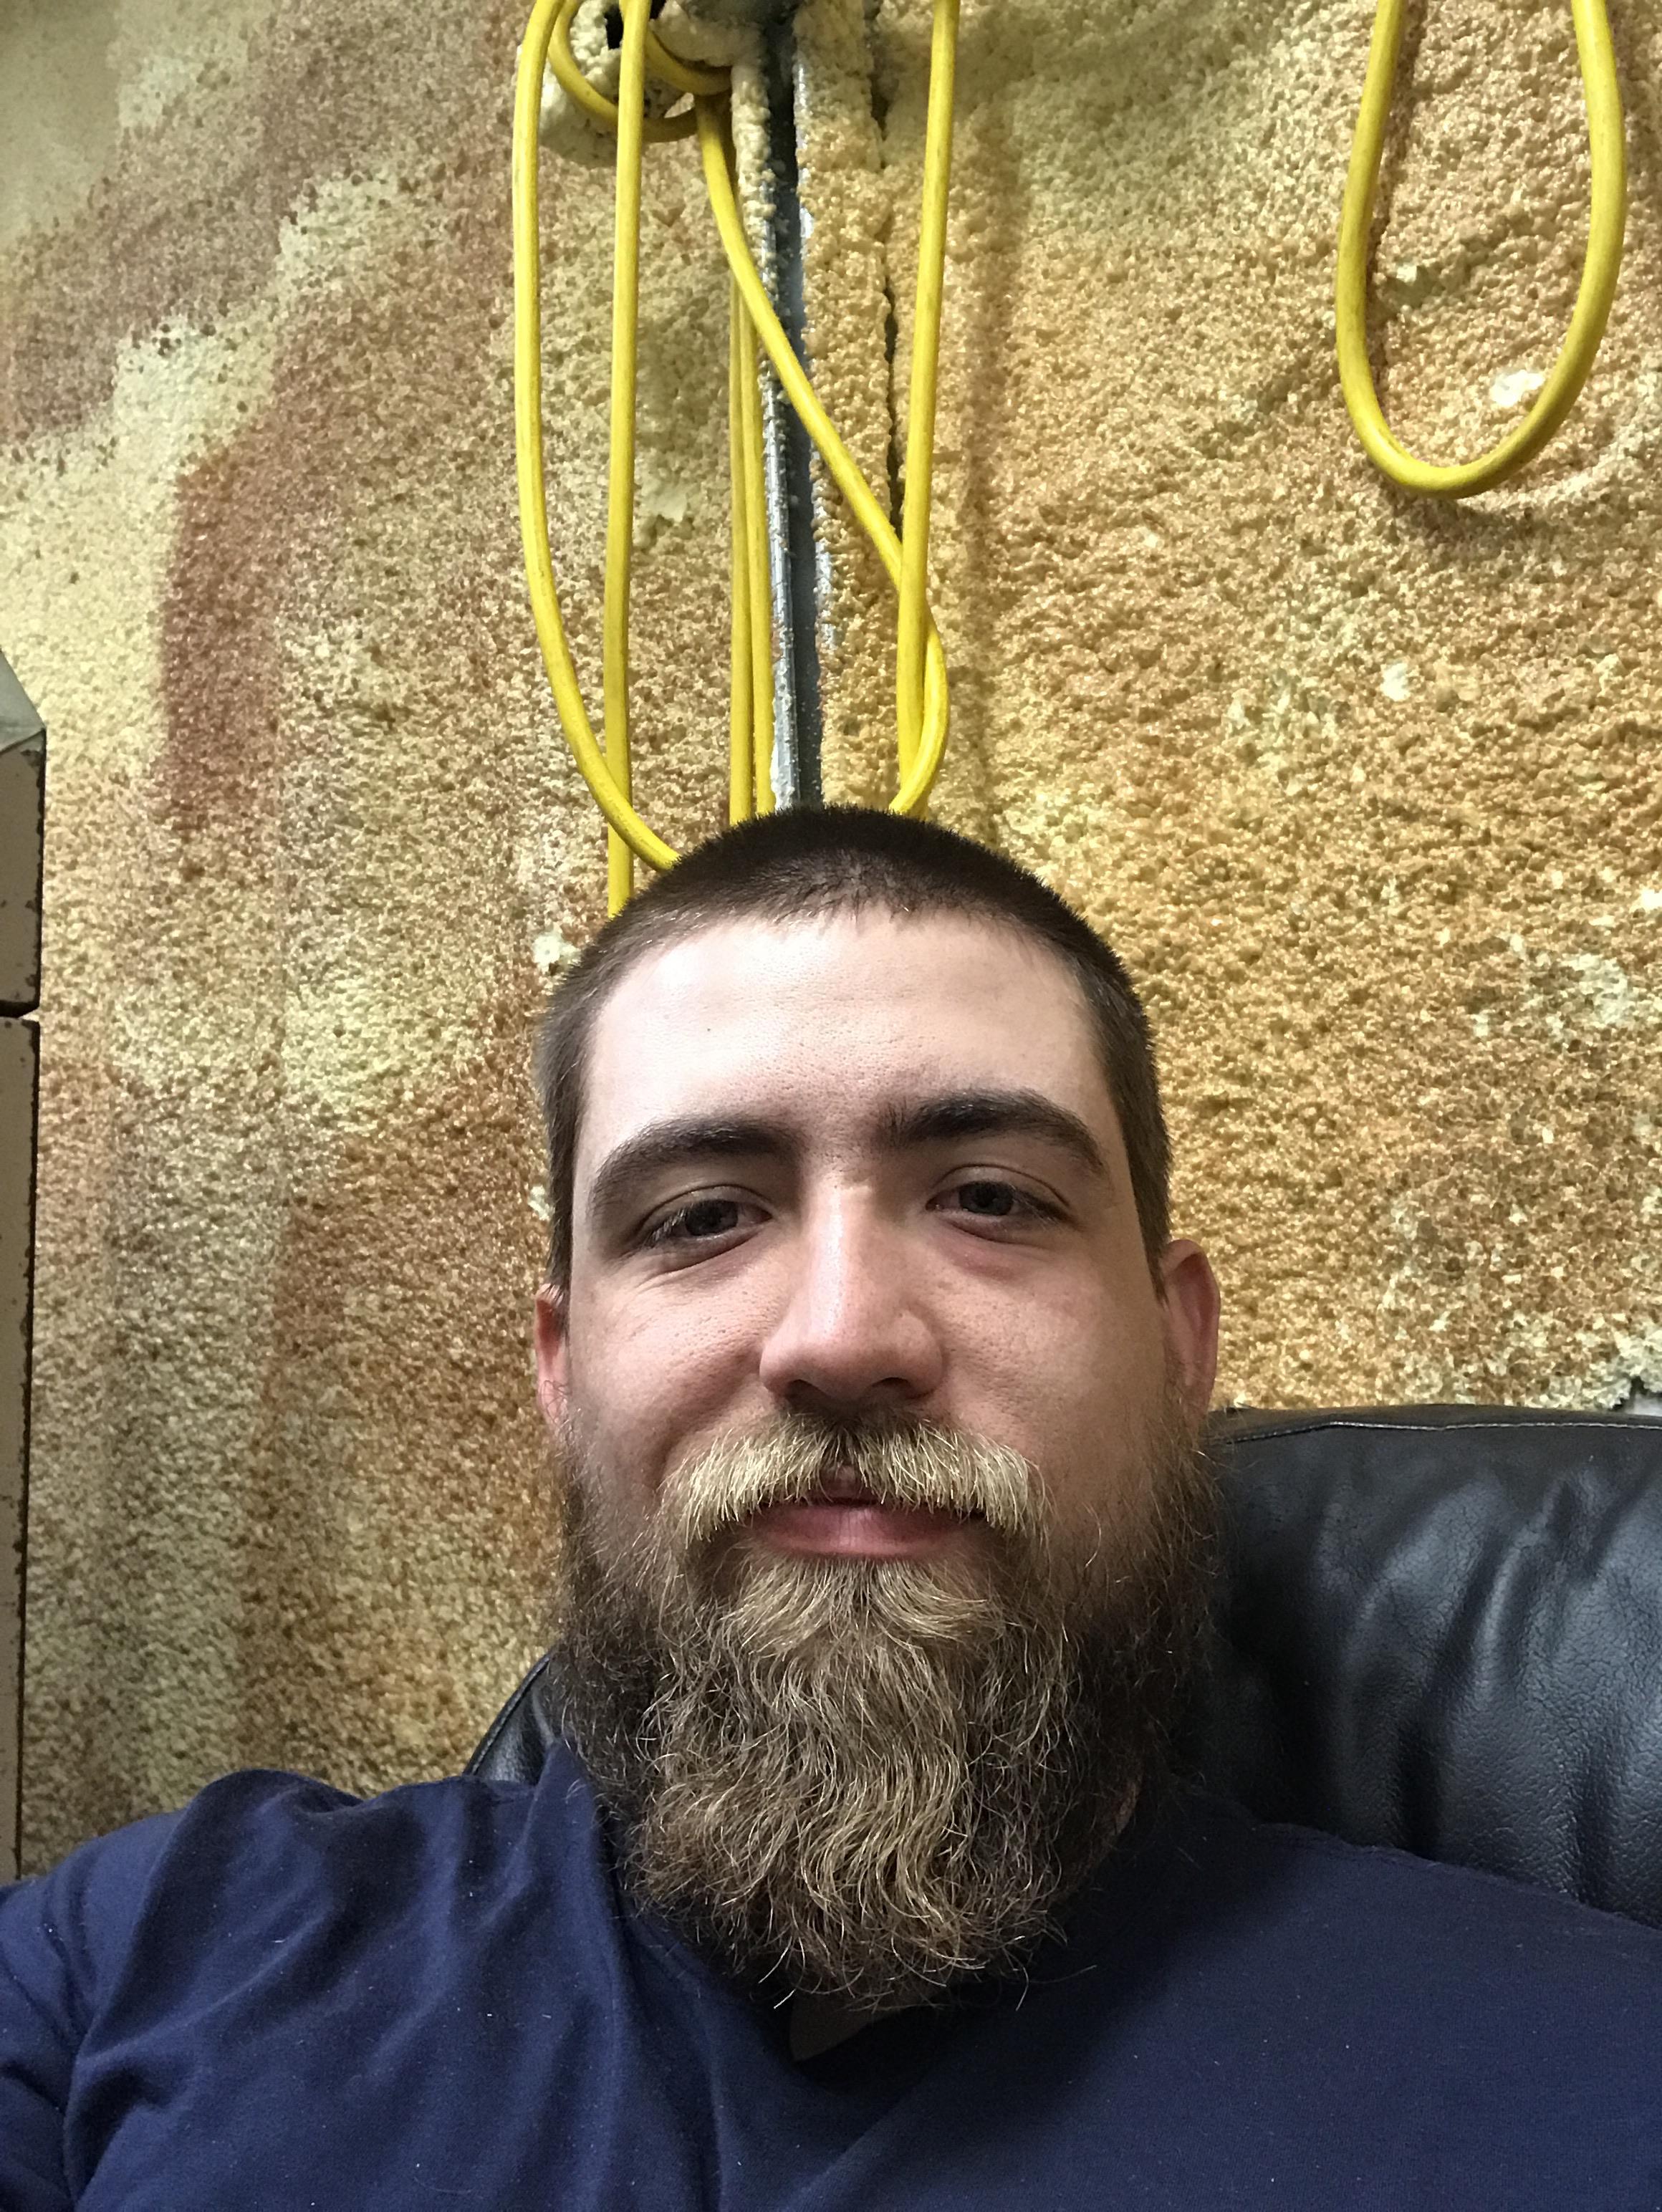 Anybody else workin' on their quarantine beard?-image_1585617285236.jpg